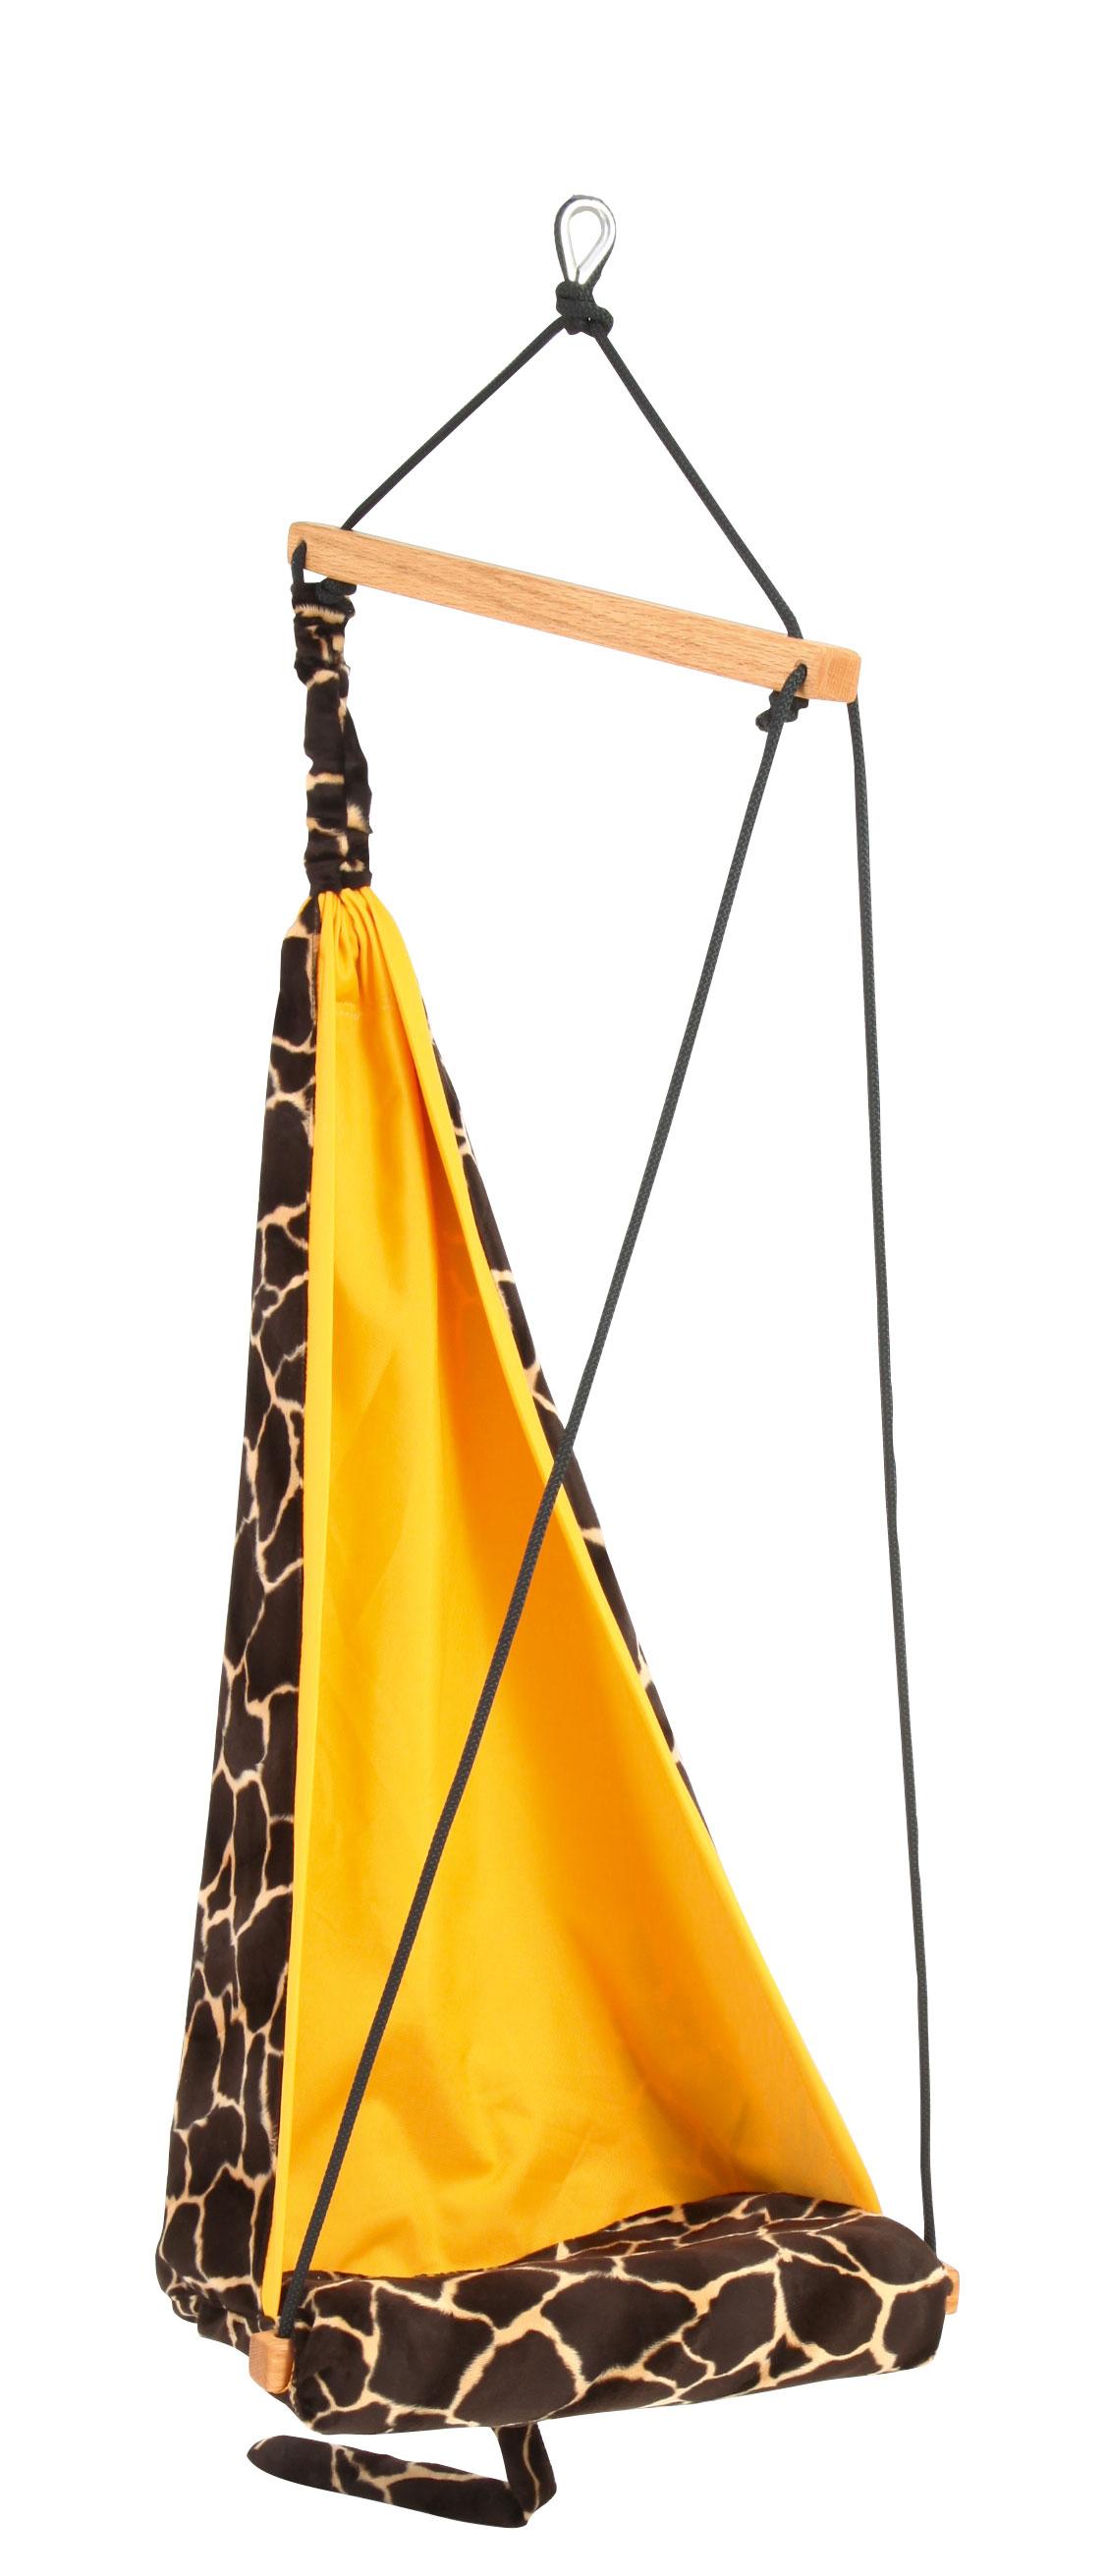 Amazonas | Hang mini giraffe kinderhangstoel